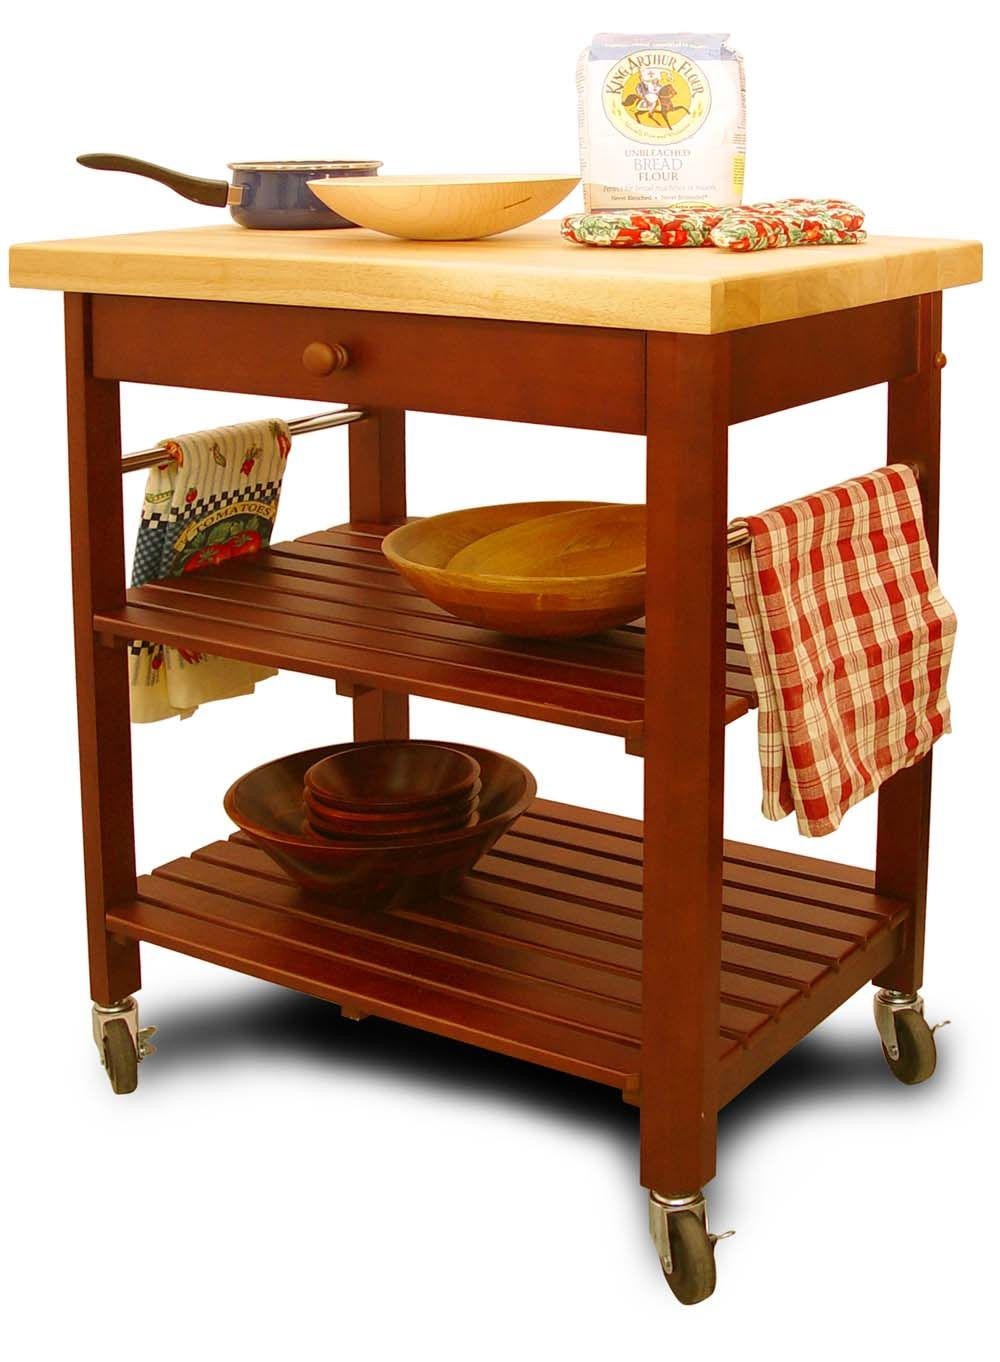 Roll About Kitchen Cart - Catskill Craftsmen | Pinterest